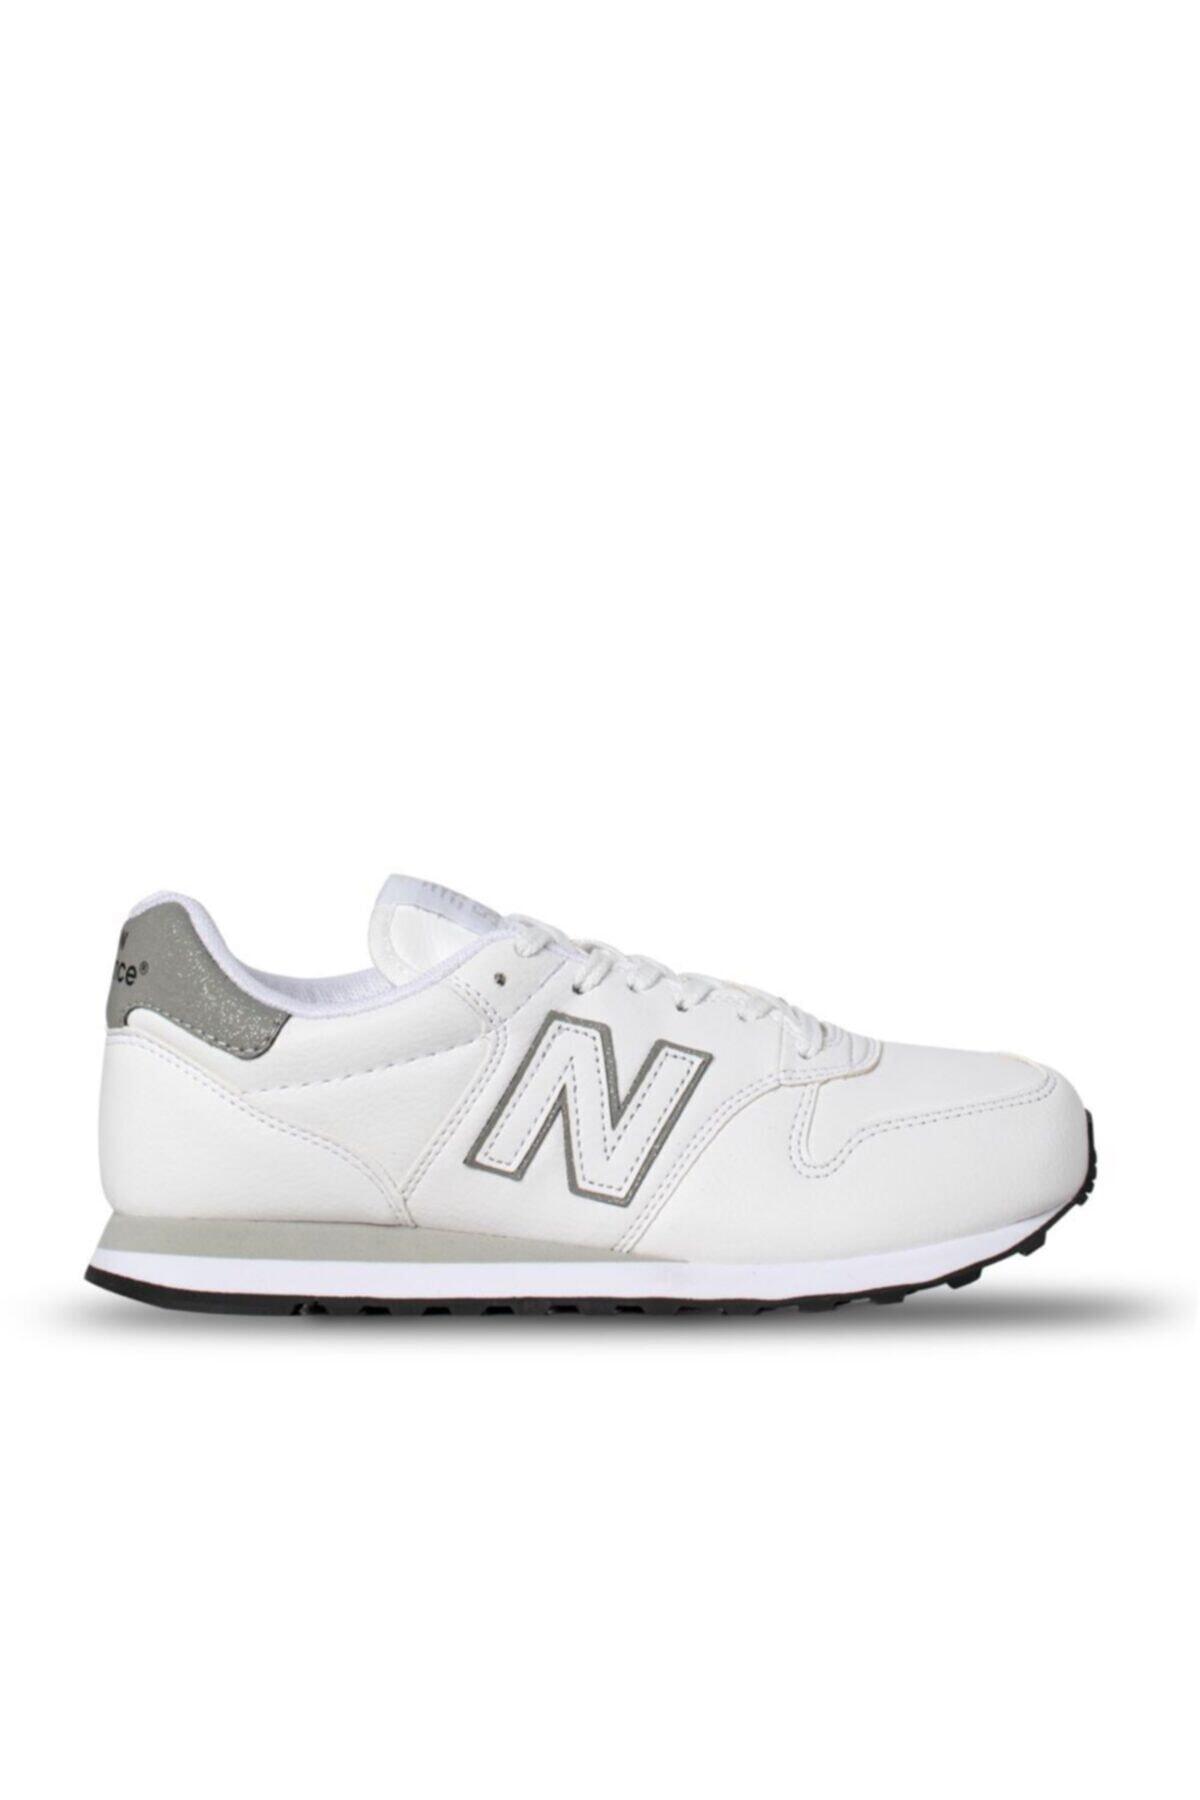 New Balance Kadın Sneaker - Lifestyle - Gw500tly 1